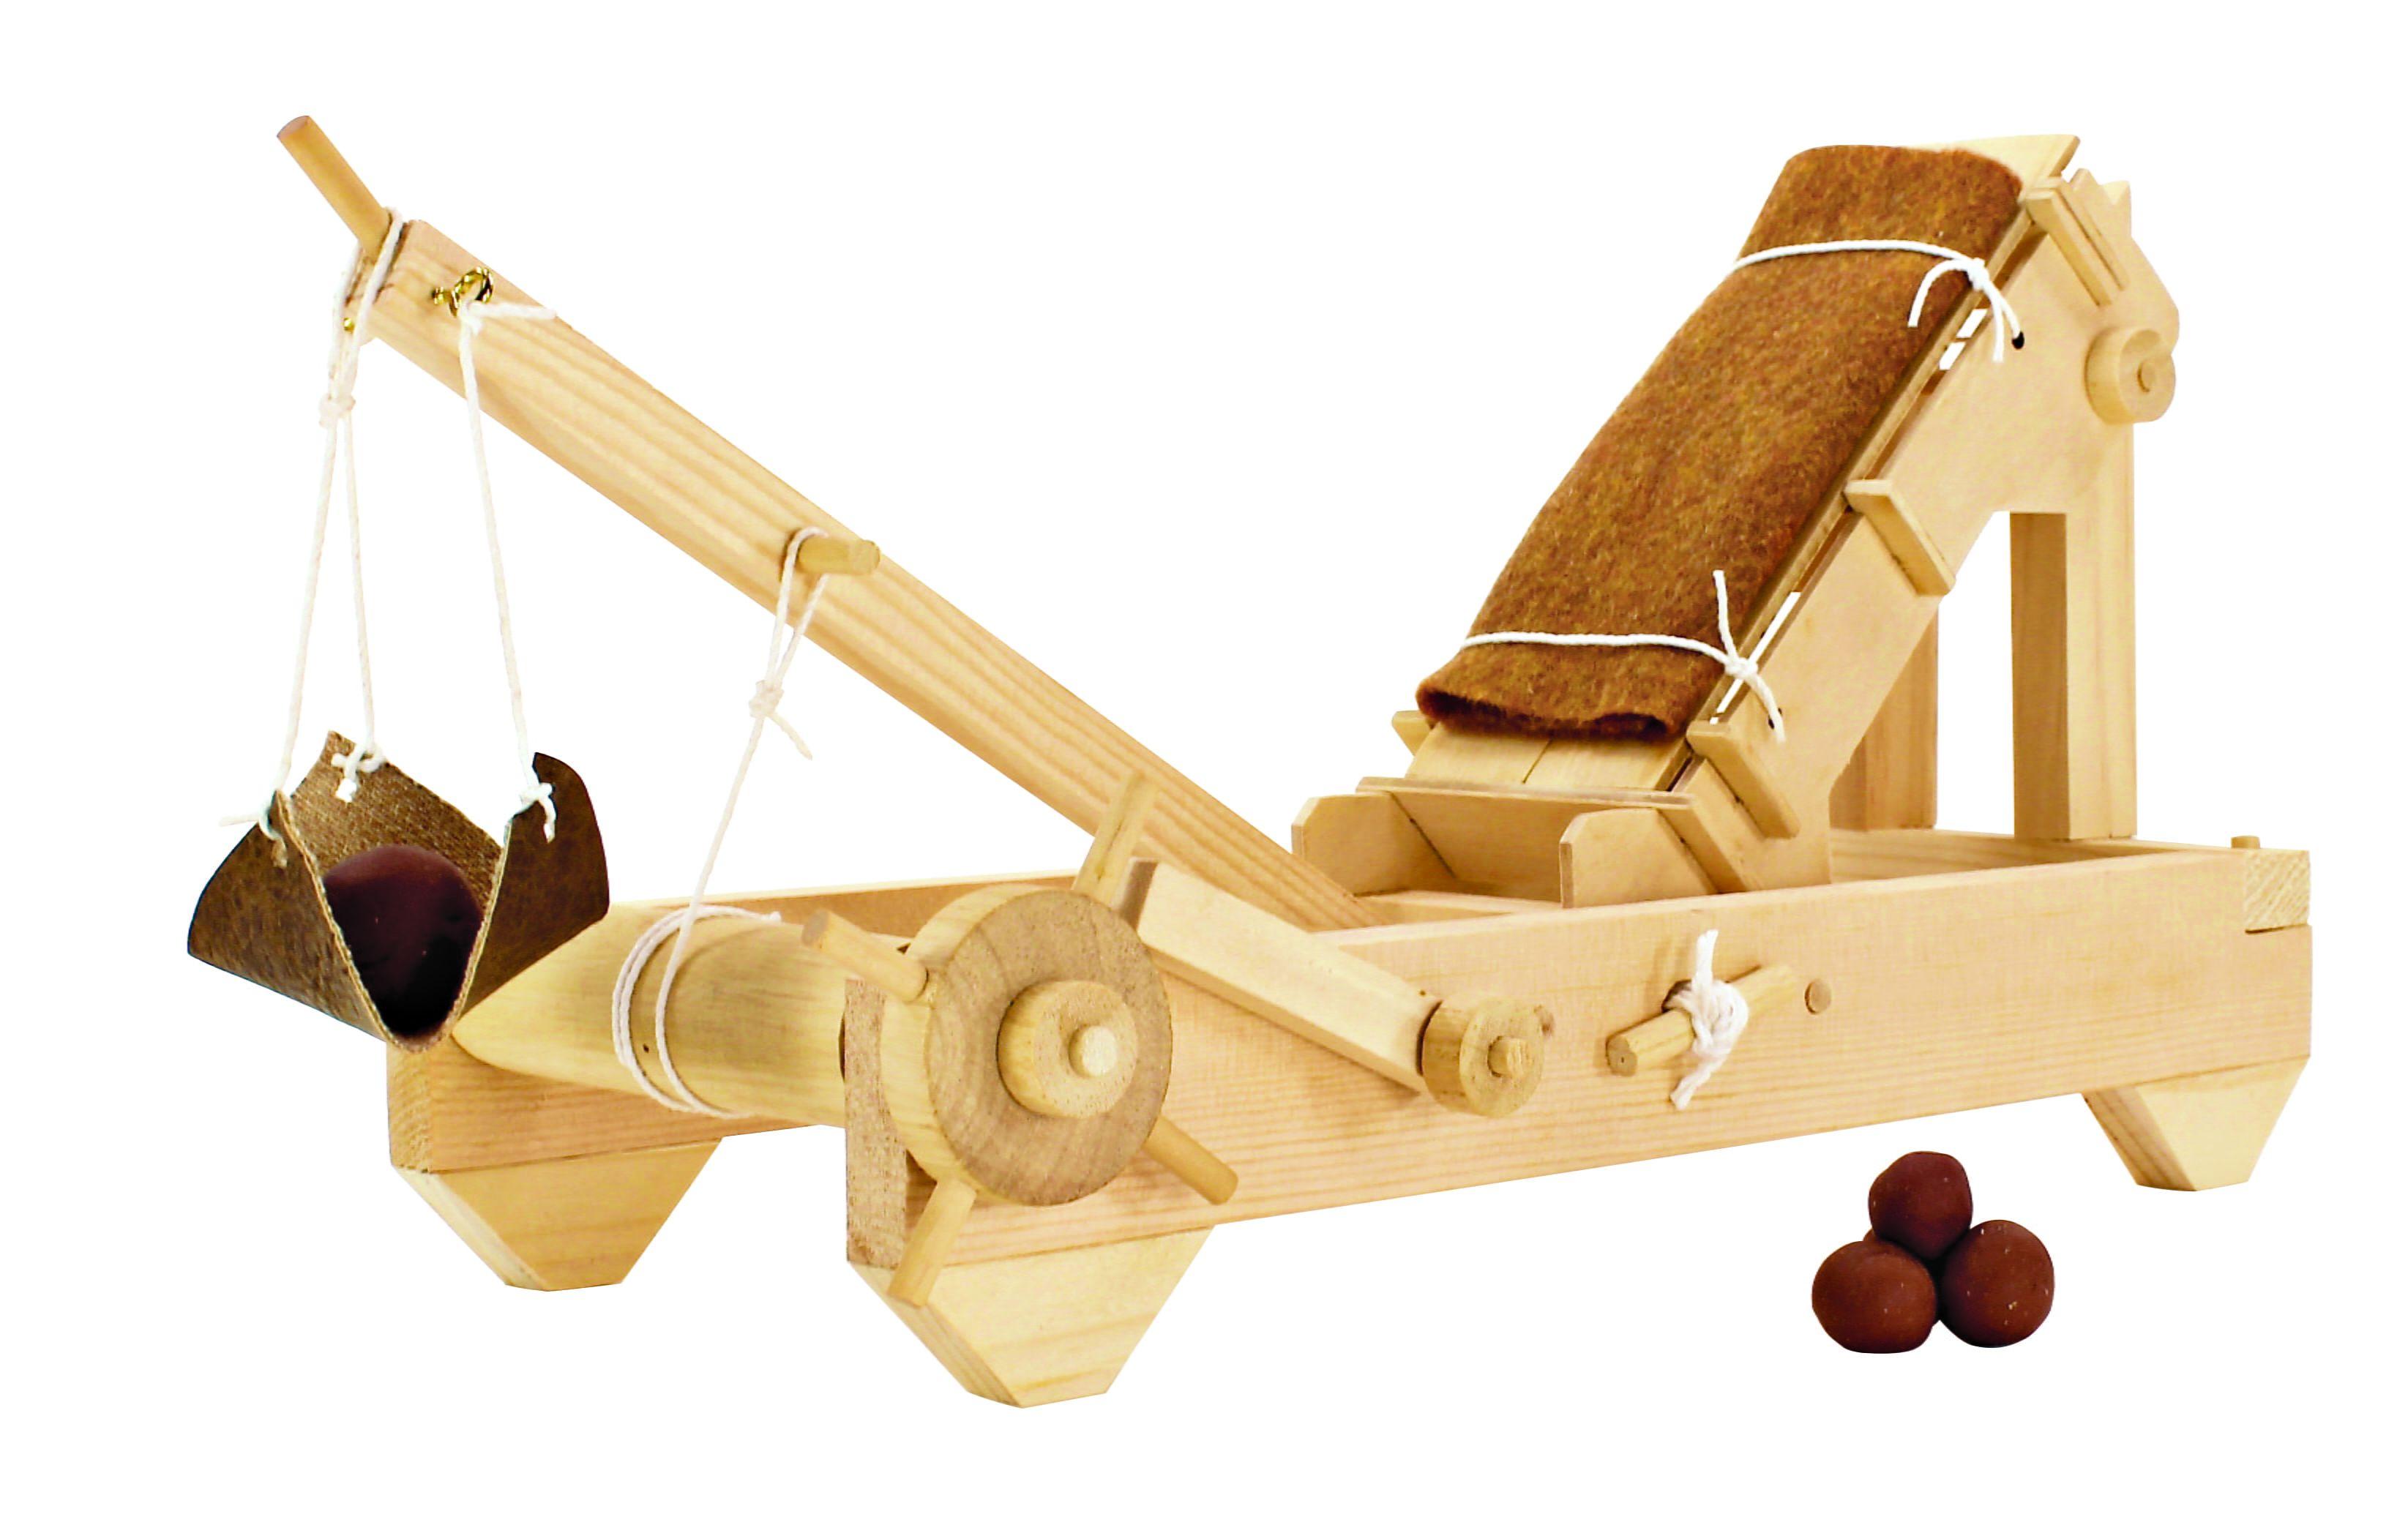 Pathfinders Roman Onager Kit